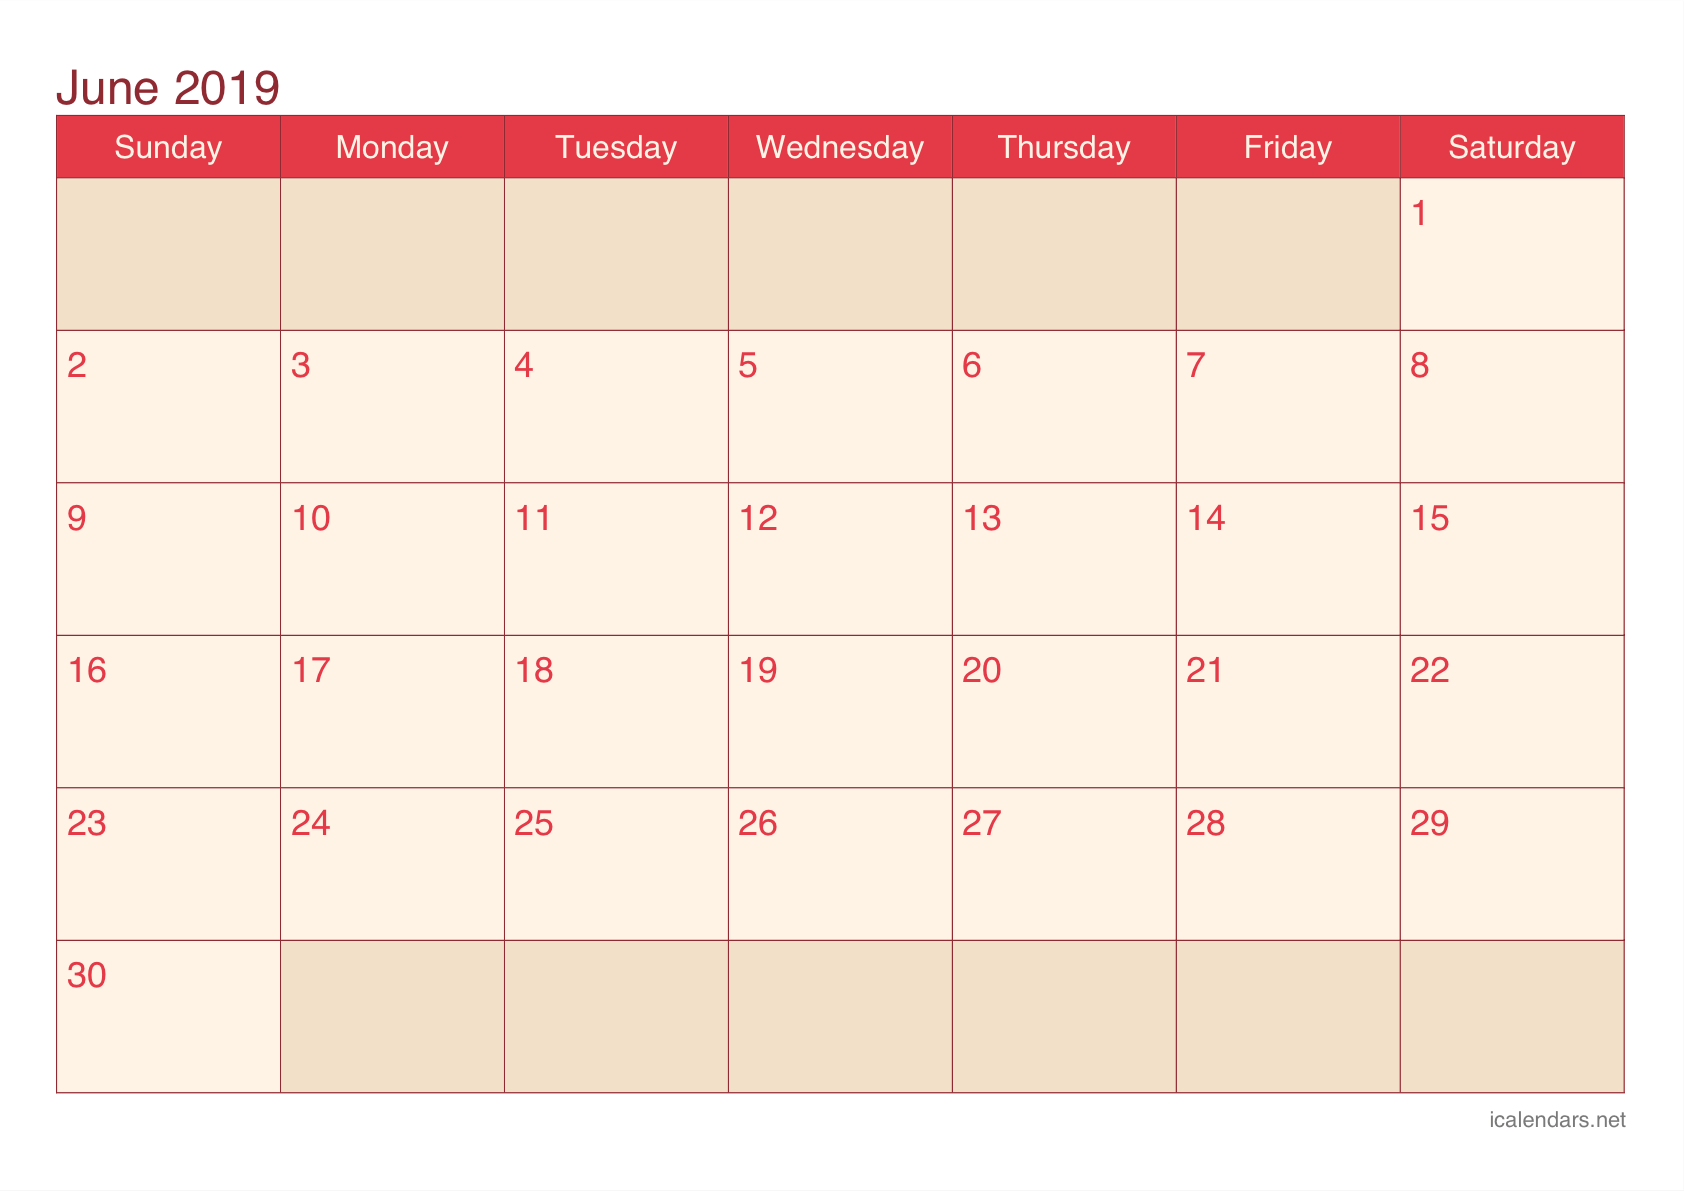 June 2019 Printable Calendar Color Theme